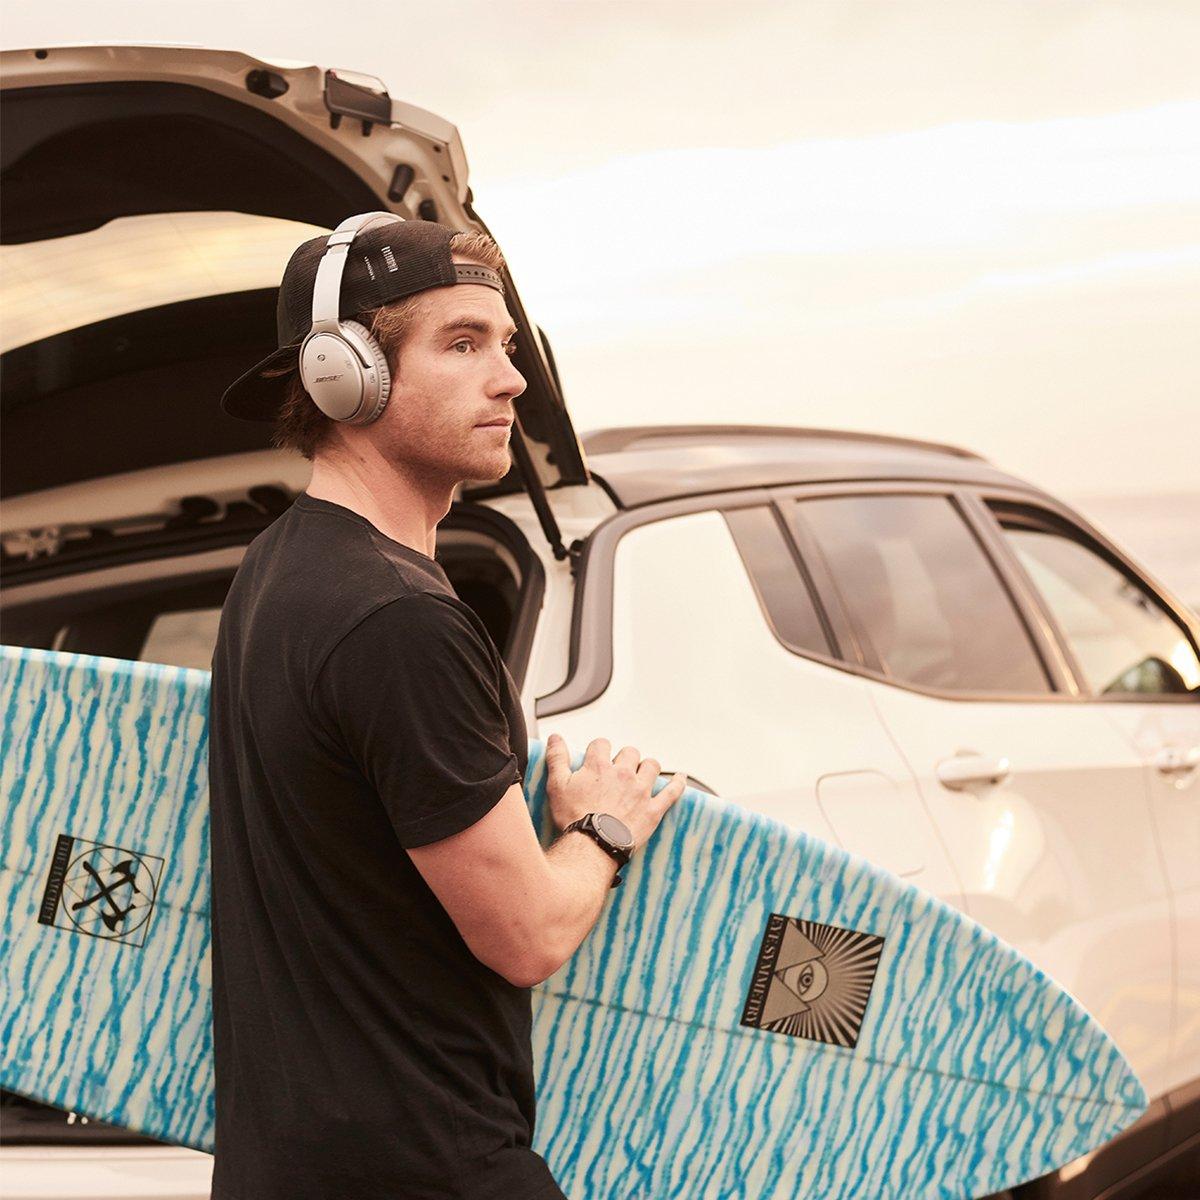 Ride the music. Ride the waves. #SurfsUp  #QC35 II https://bose.life/2YitAU0   📸: @hayden_quinn